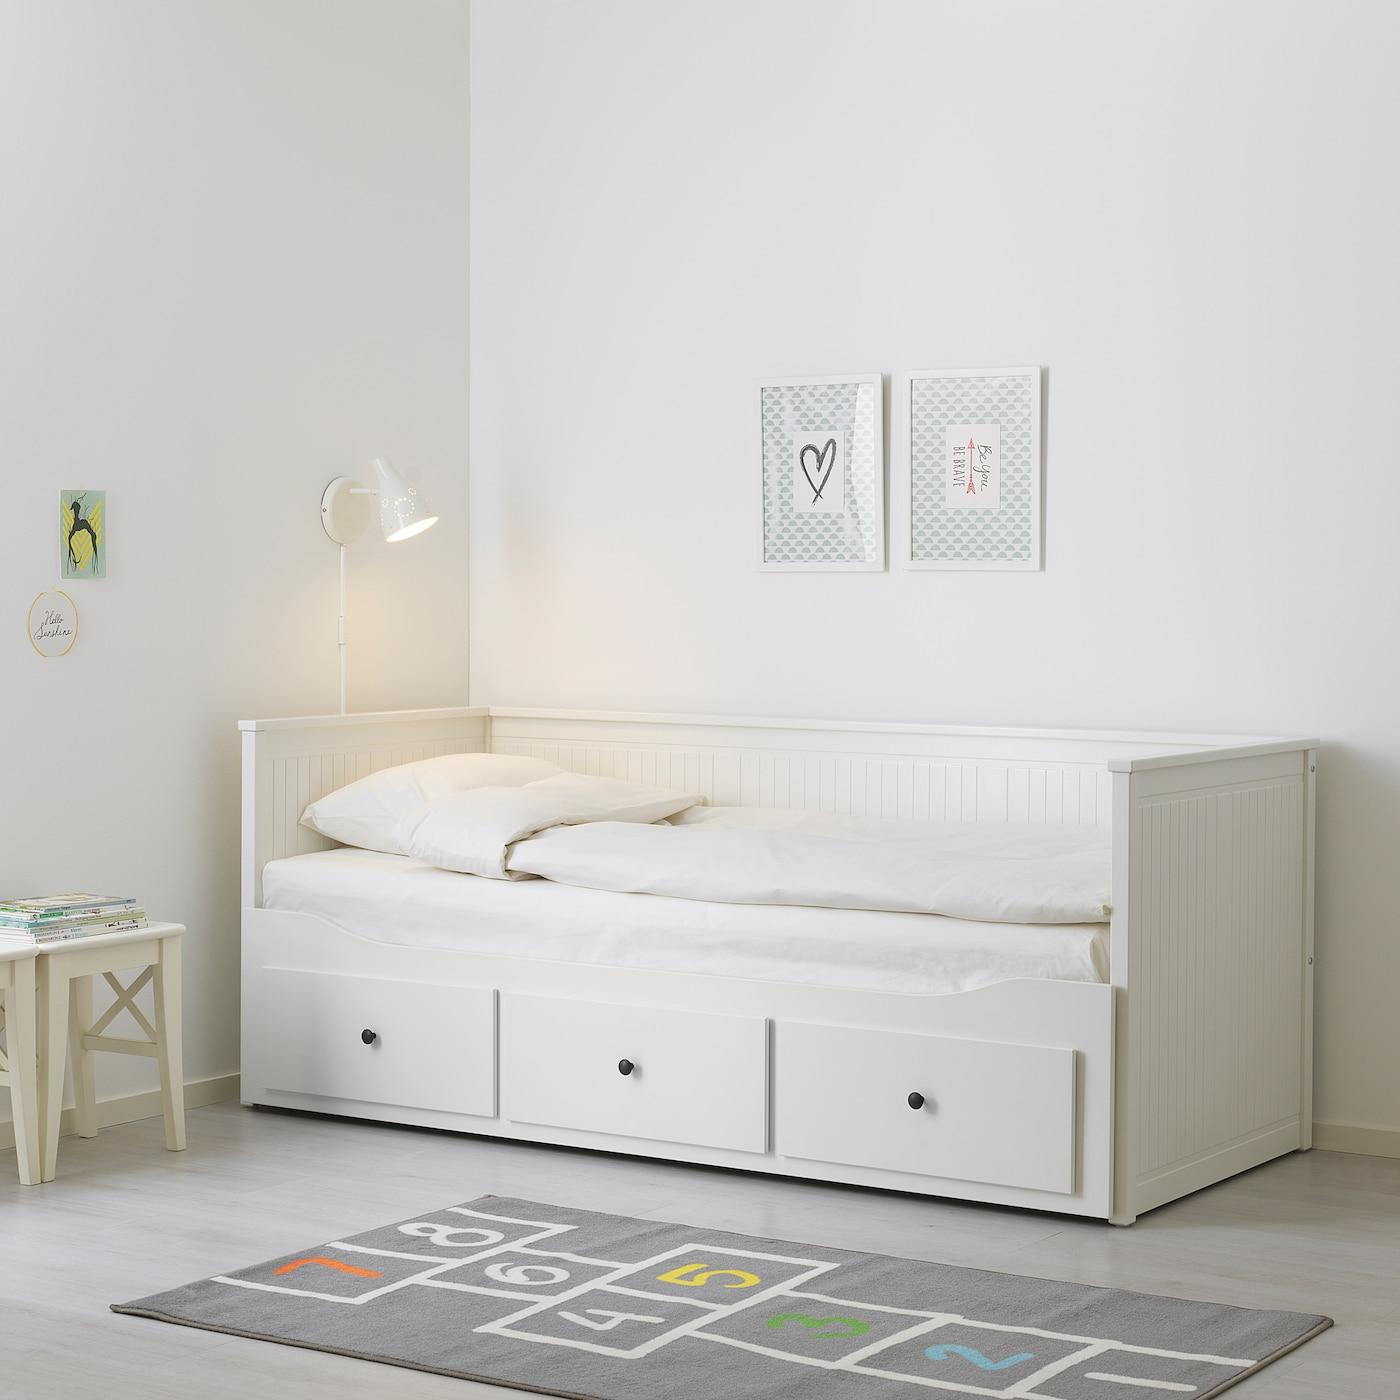 Ikea Tweepersoons Bedbank.Hemnes Day Bed W 3 Drawers 2 Mattresses White Husvika Firm Ikea